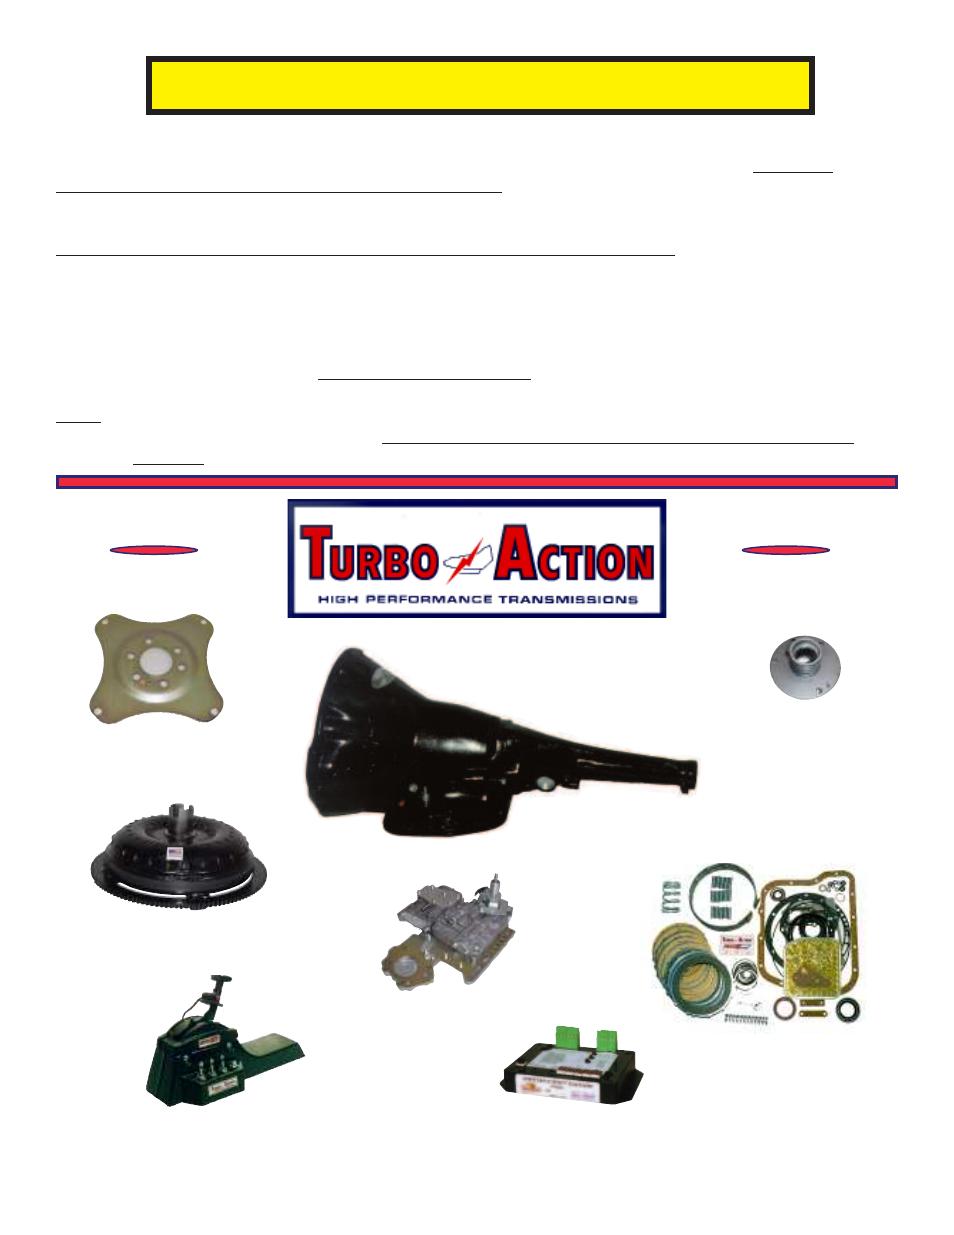 water burnout instructions turbo action 17880xa torqueflite 727 rh manualsdir com 727 Automatic Transmission Rebuild 727 Automatic Transmission Rebuild